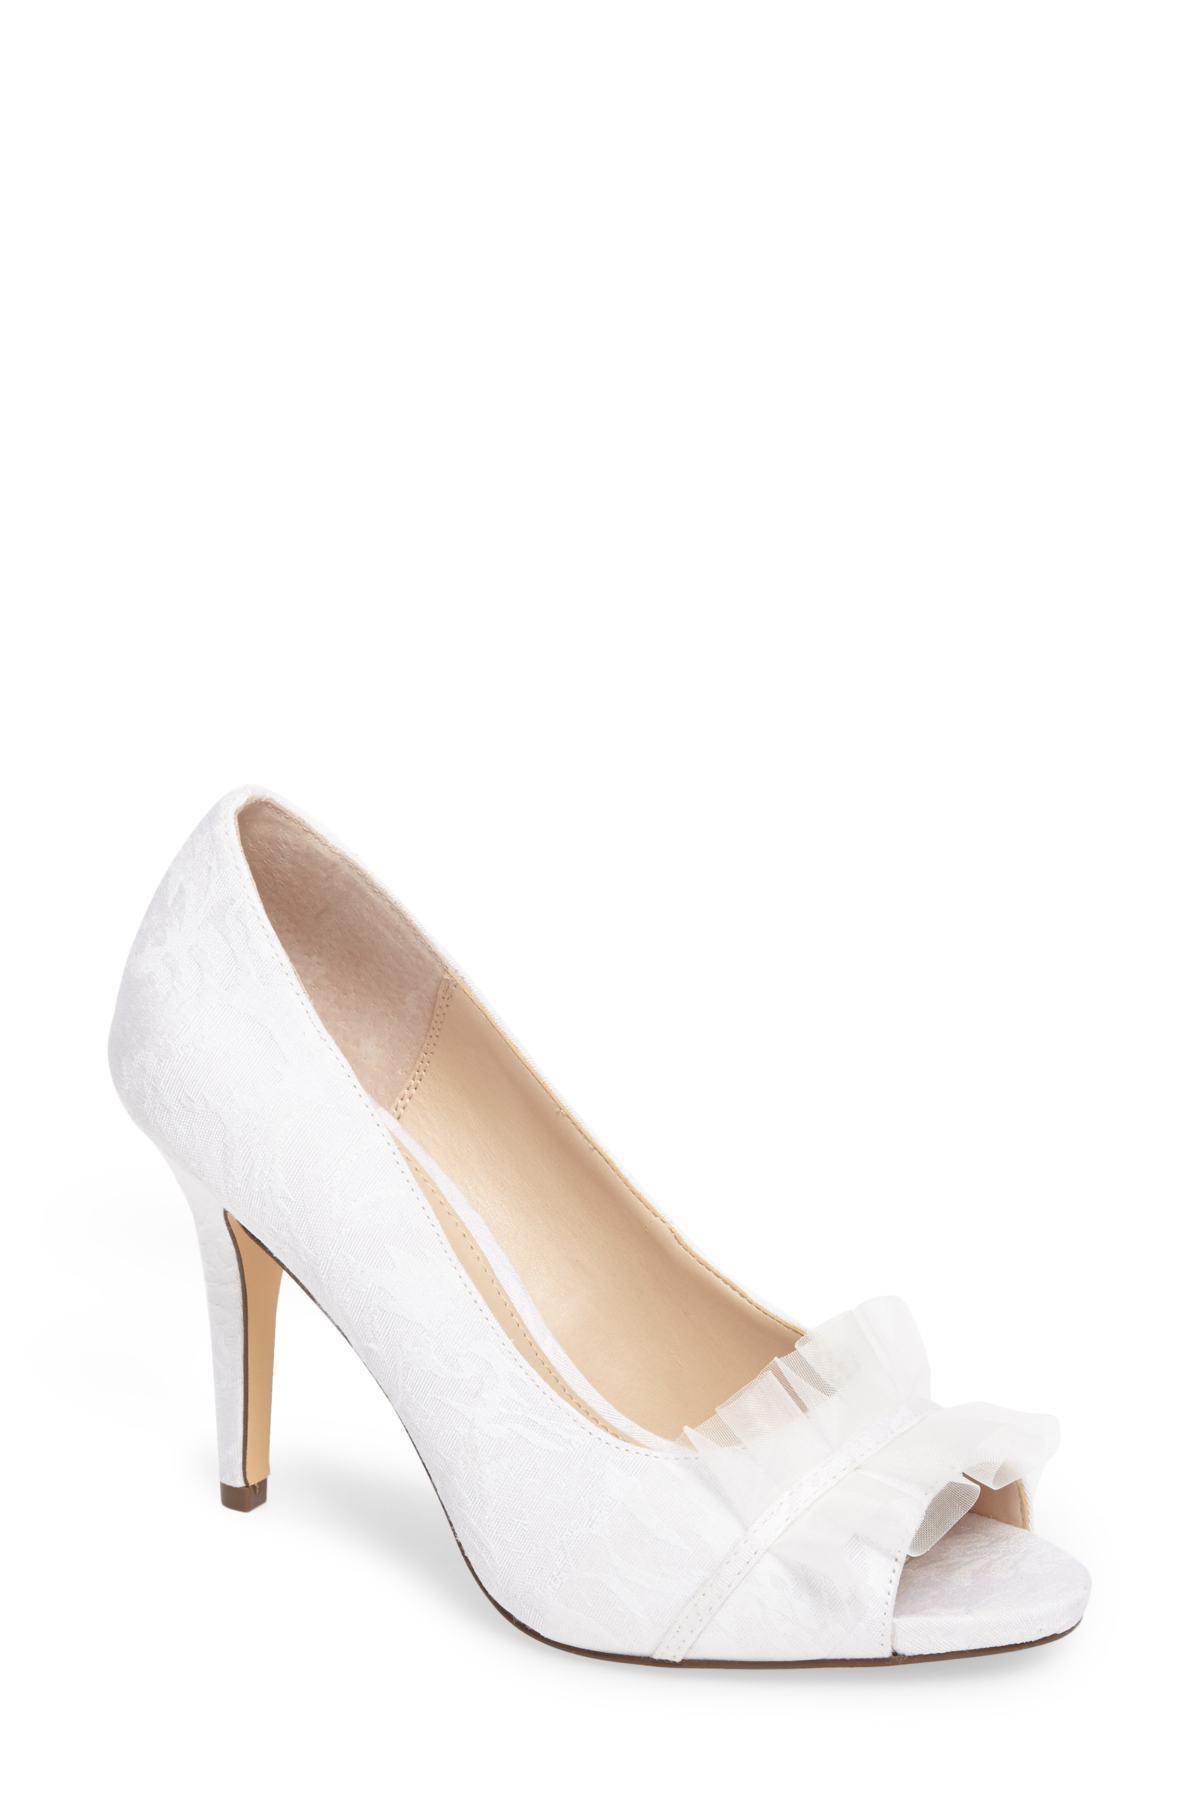 a58c79b2f7d5 Lyst - Nina Raizel Ruffle Open Toe Pump (women) in White